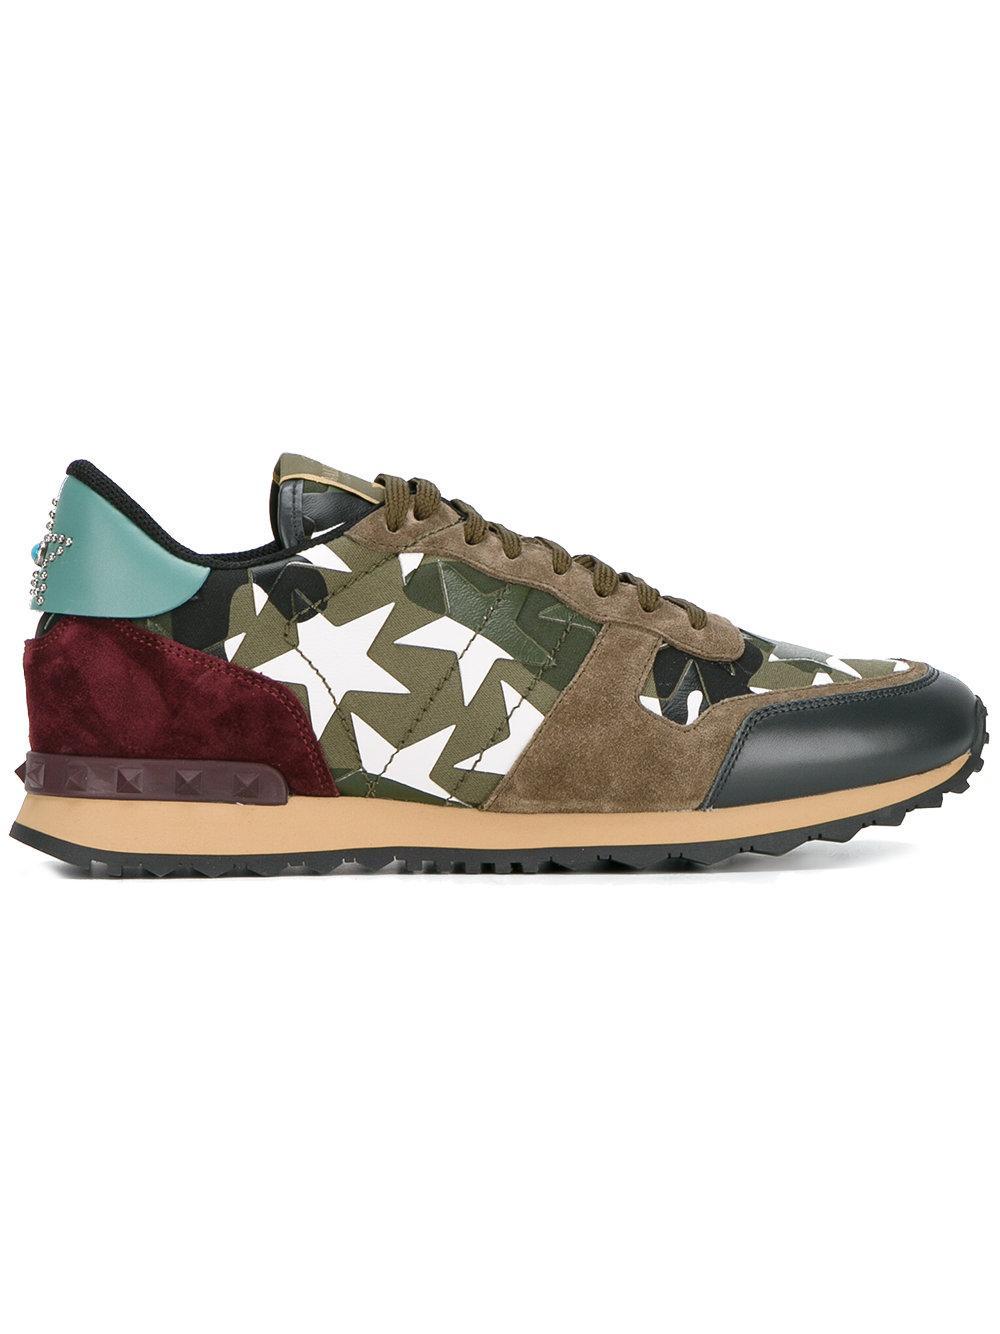 a04d7a07c768b Valentino - Garavani Rockrunner Sneakers - Men - Cotton/leather ...